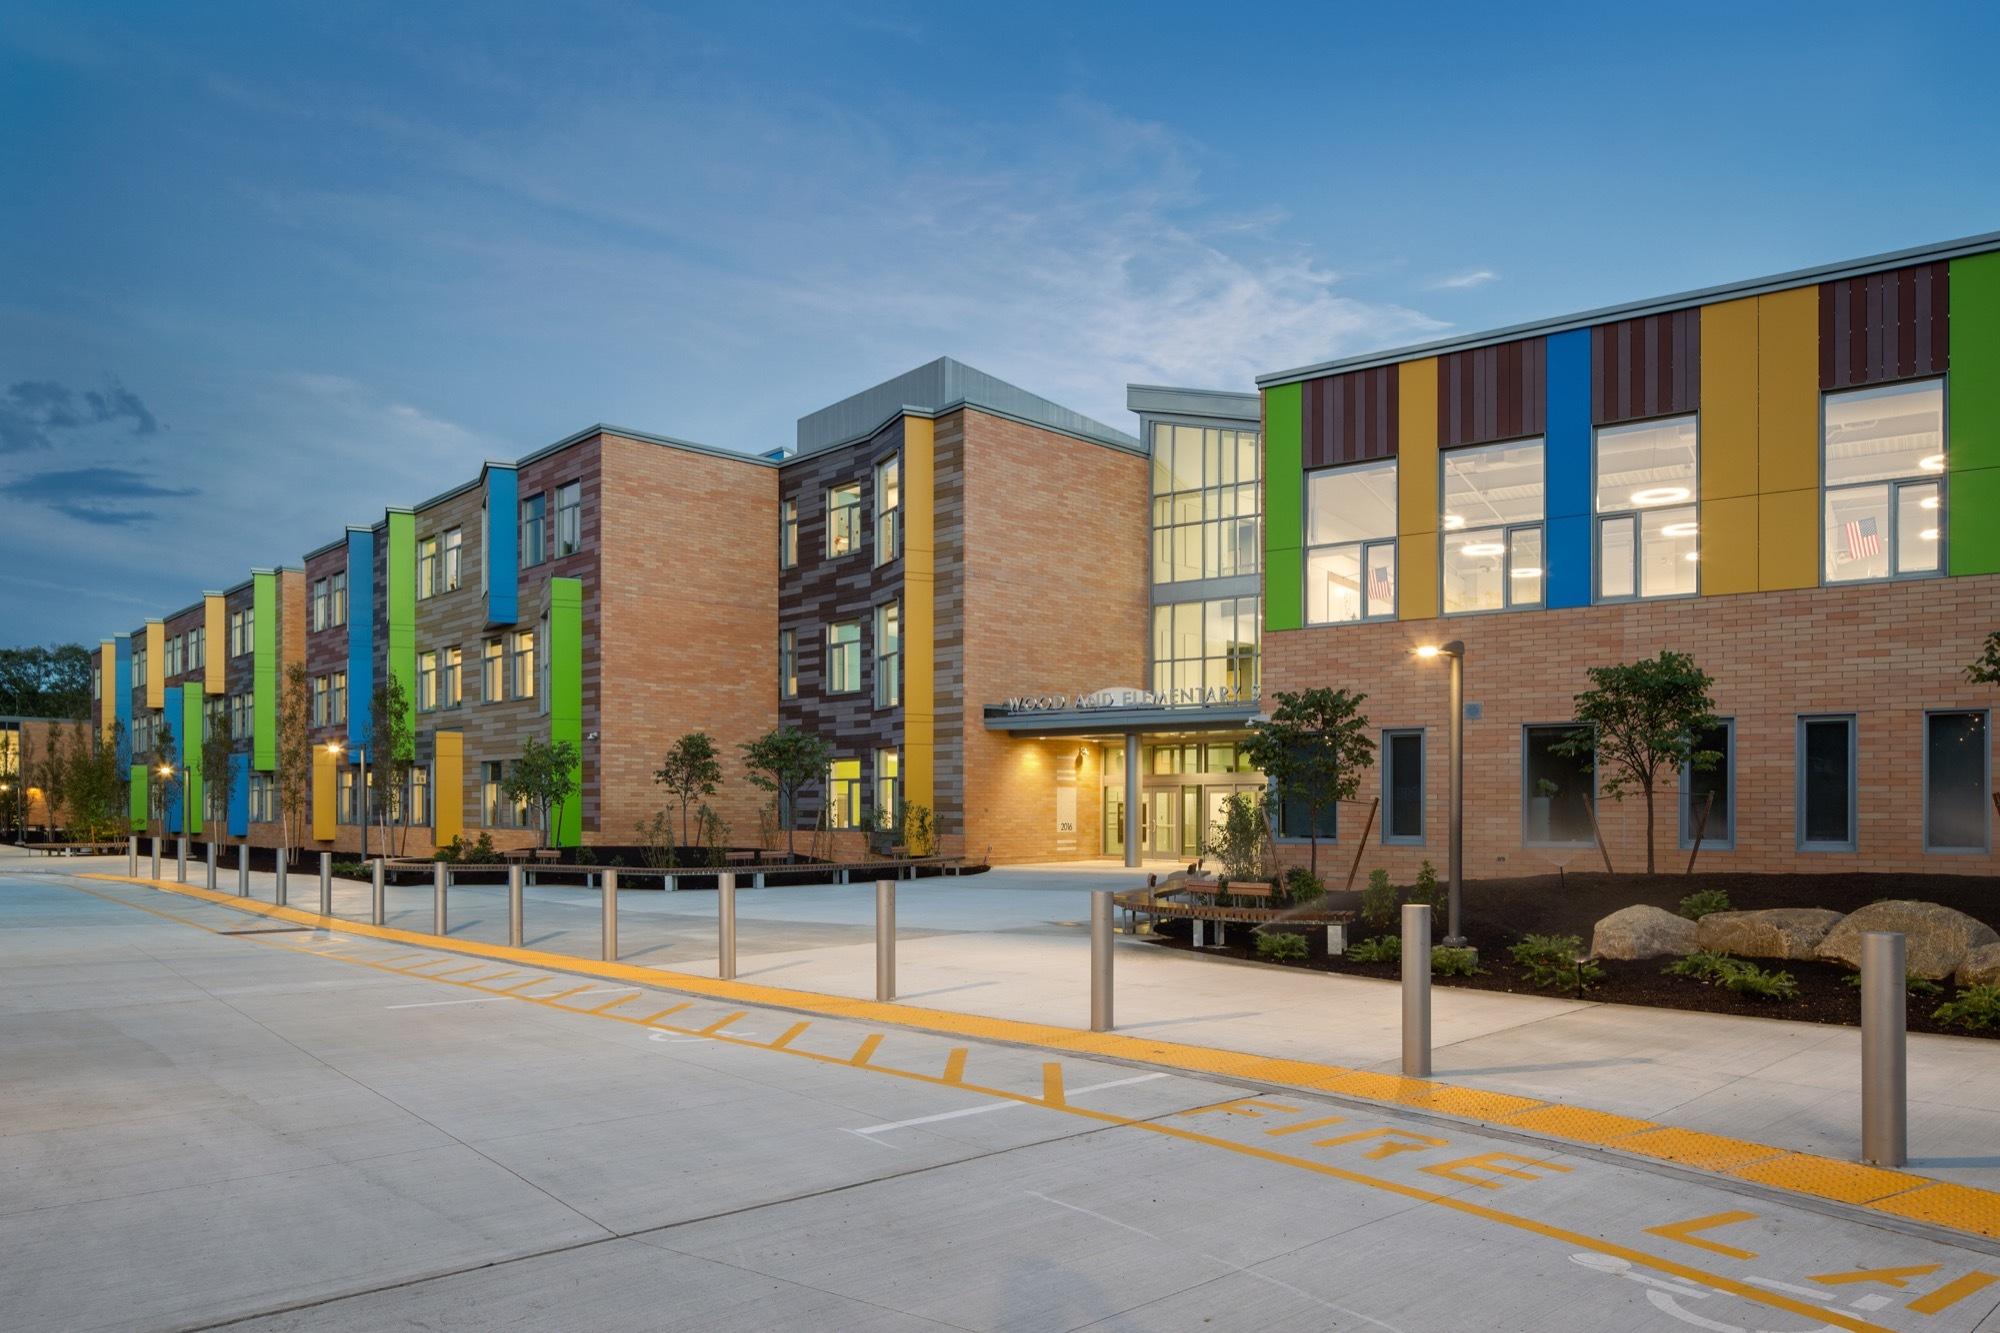 Gallery of Woodland Elementary School / HMFH Architects - 15